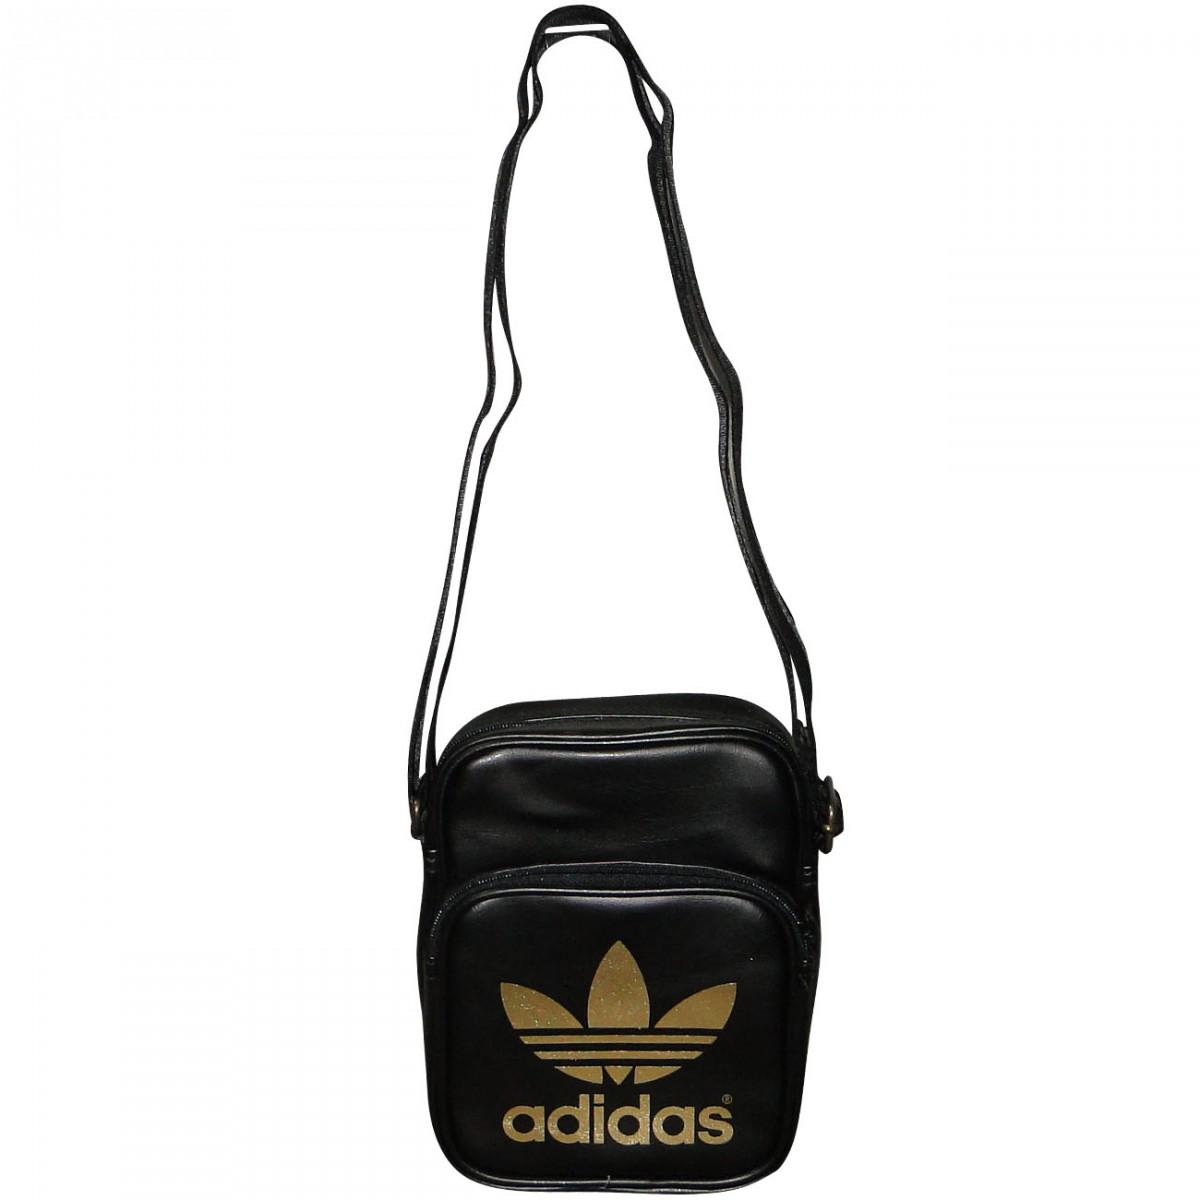 f18bf889465 Bolsa Adidas Mini Bag G84848 - Preto Dourado - Chuteira Nike